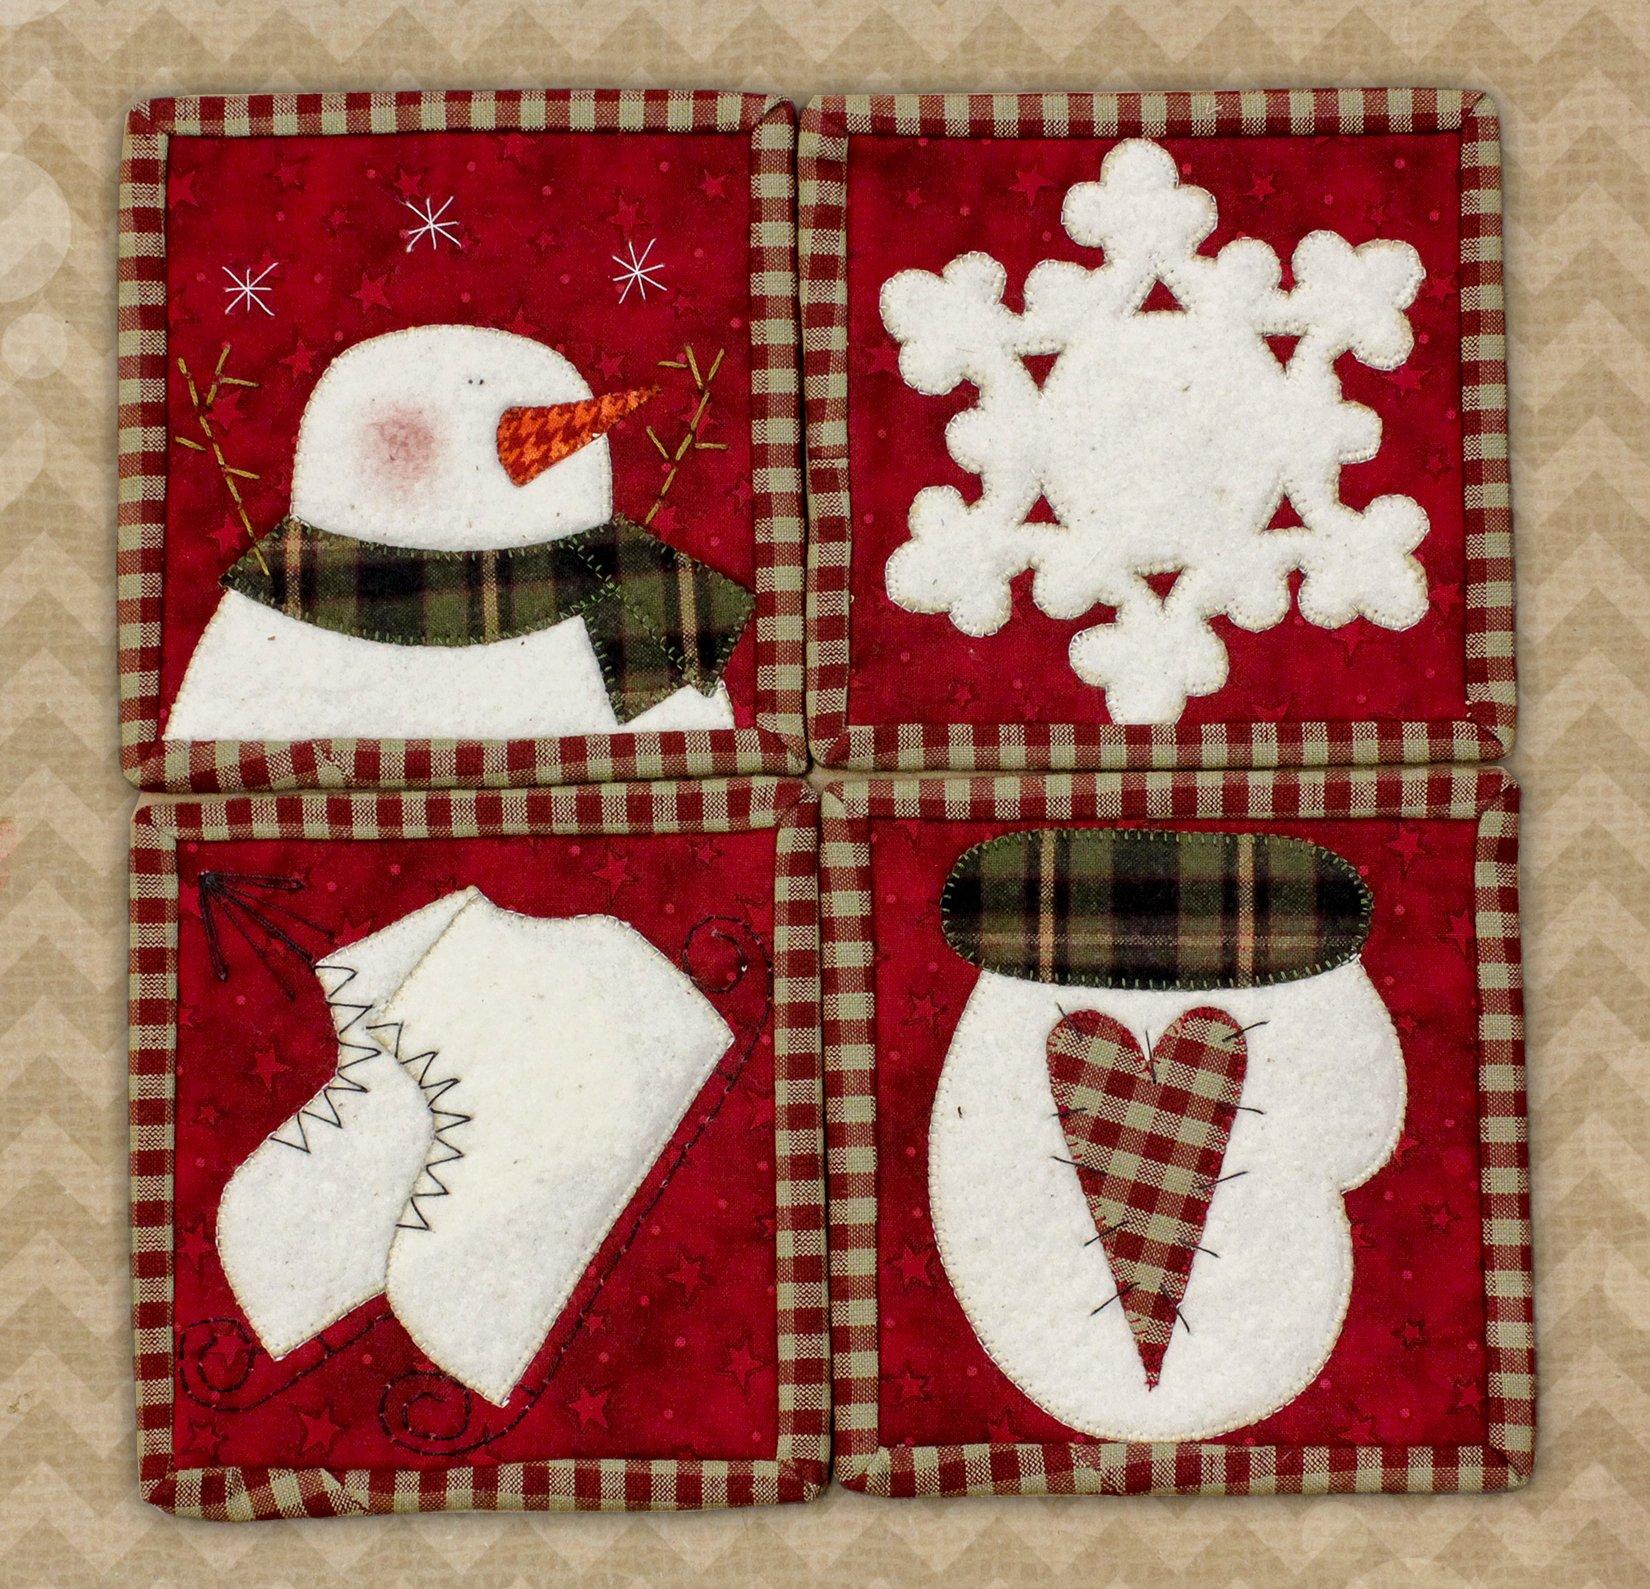 Winter Coaster Mug Applique Kit with Precuts